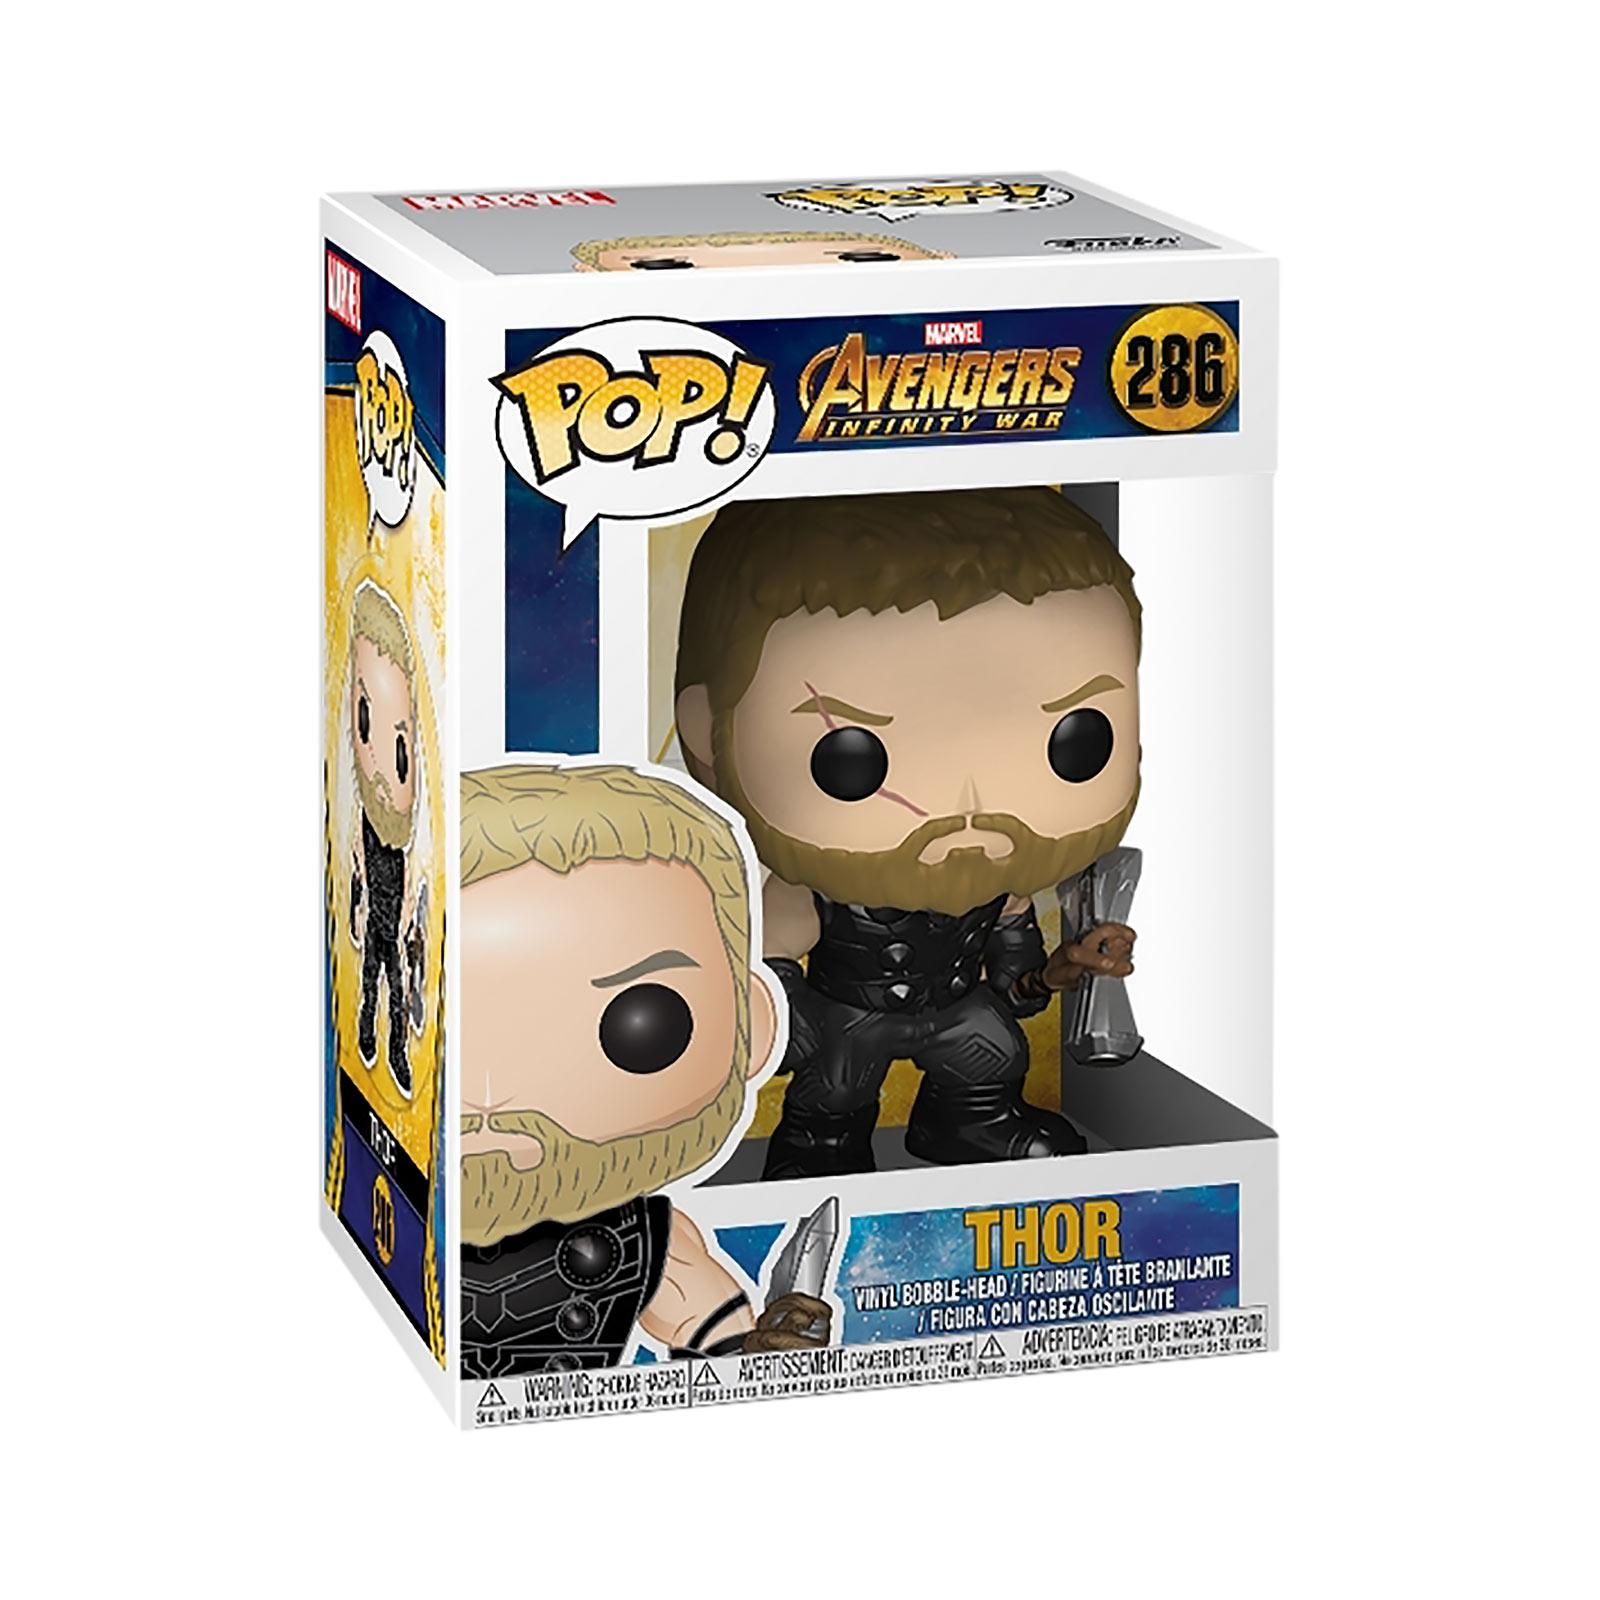 Avengers - Thor Infinity War Funko Pop Wackelkopf-Figur